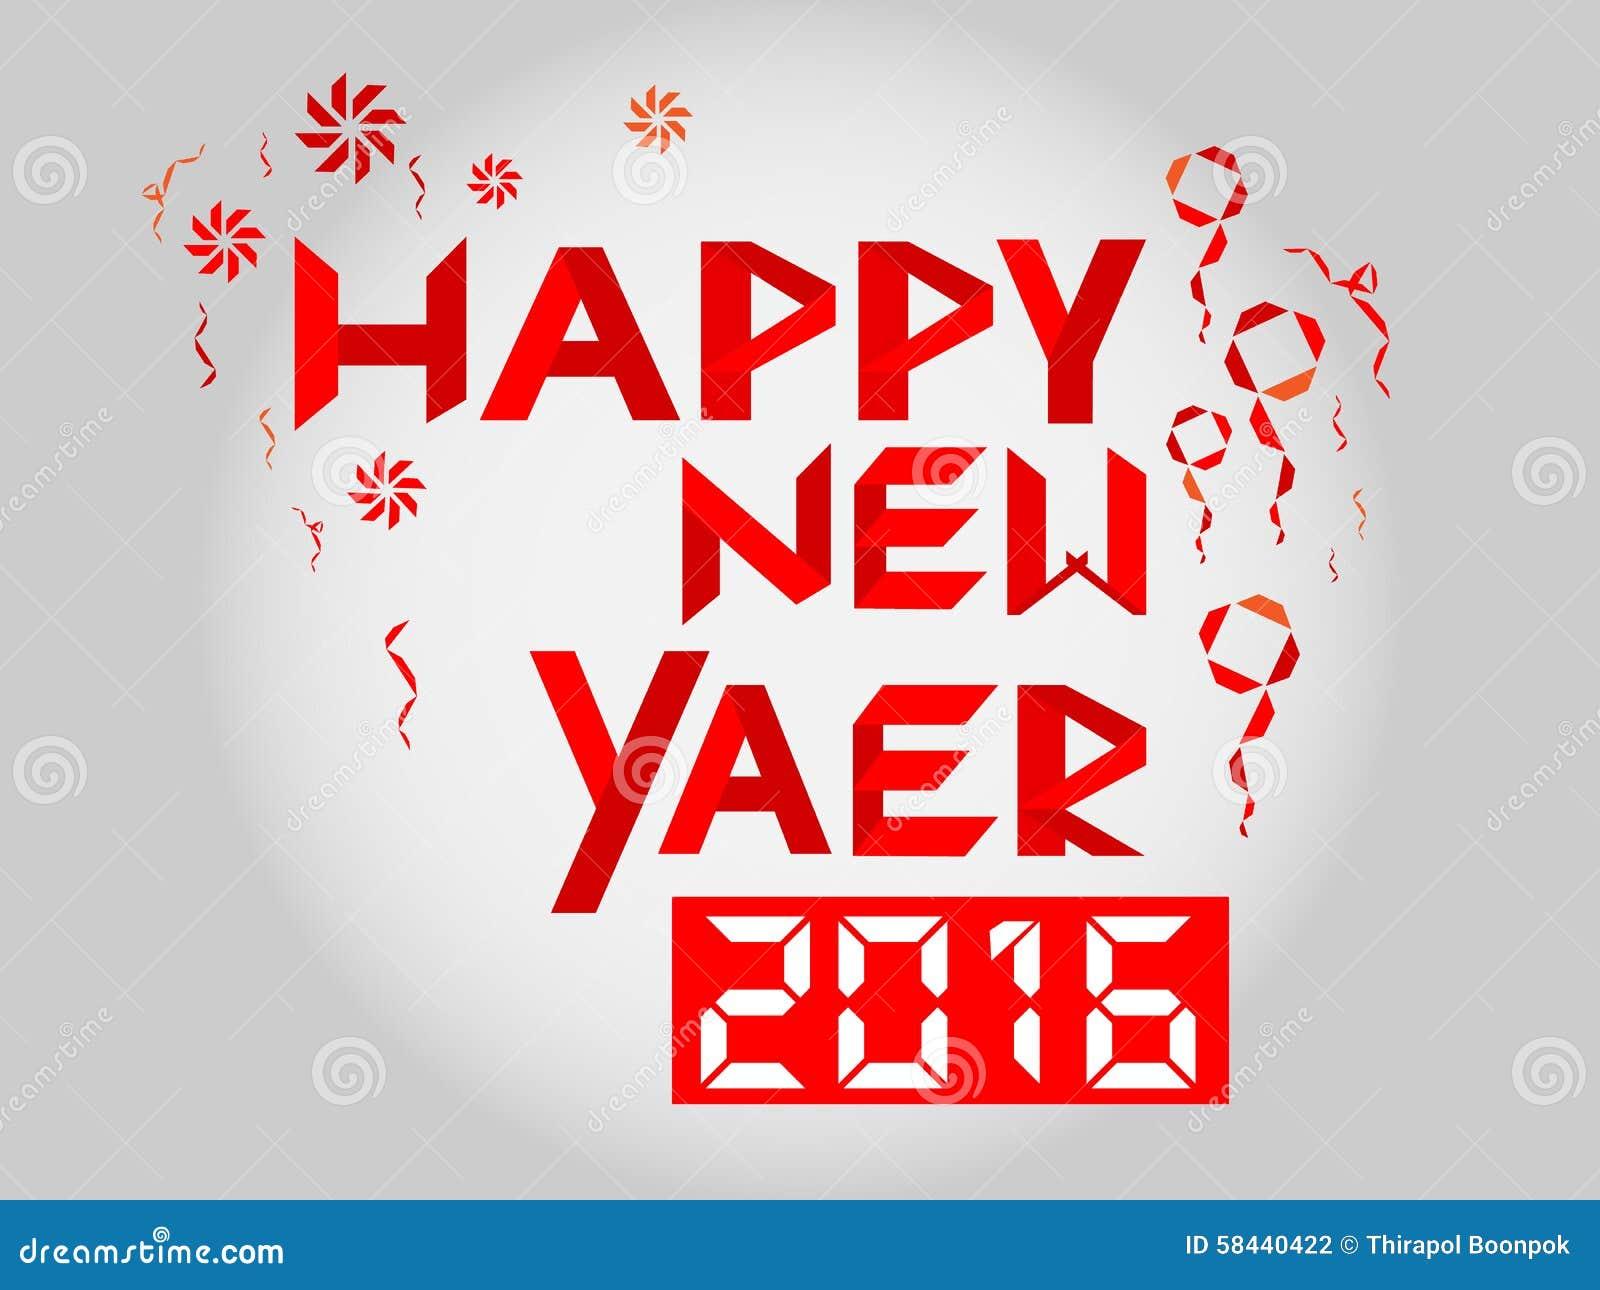 happy new year 2016 digital ribbon text vector stock vector